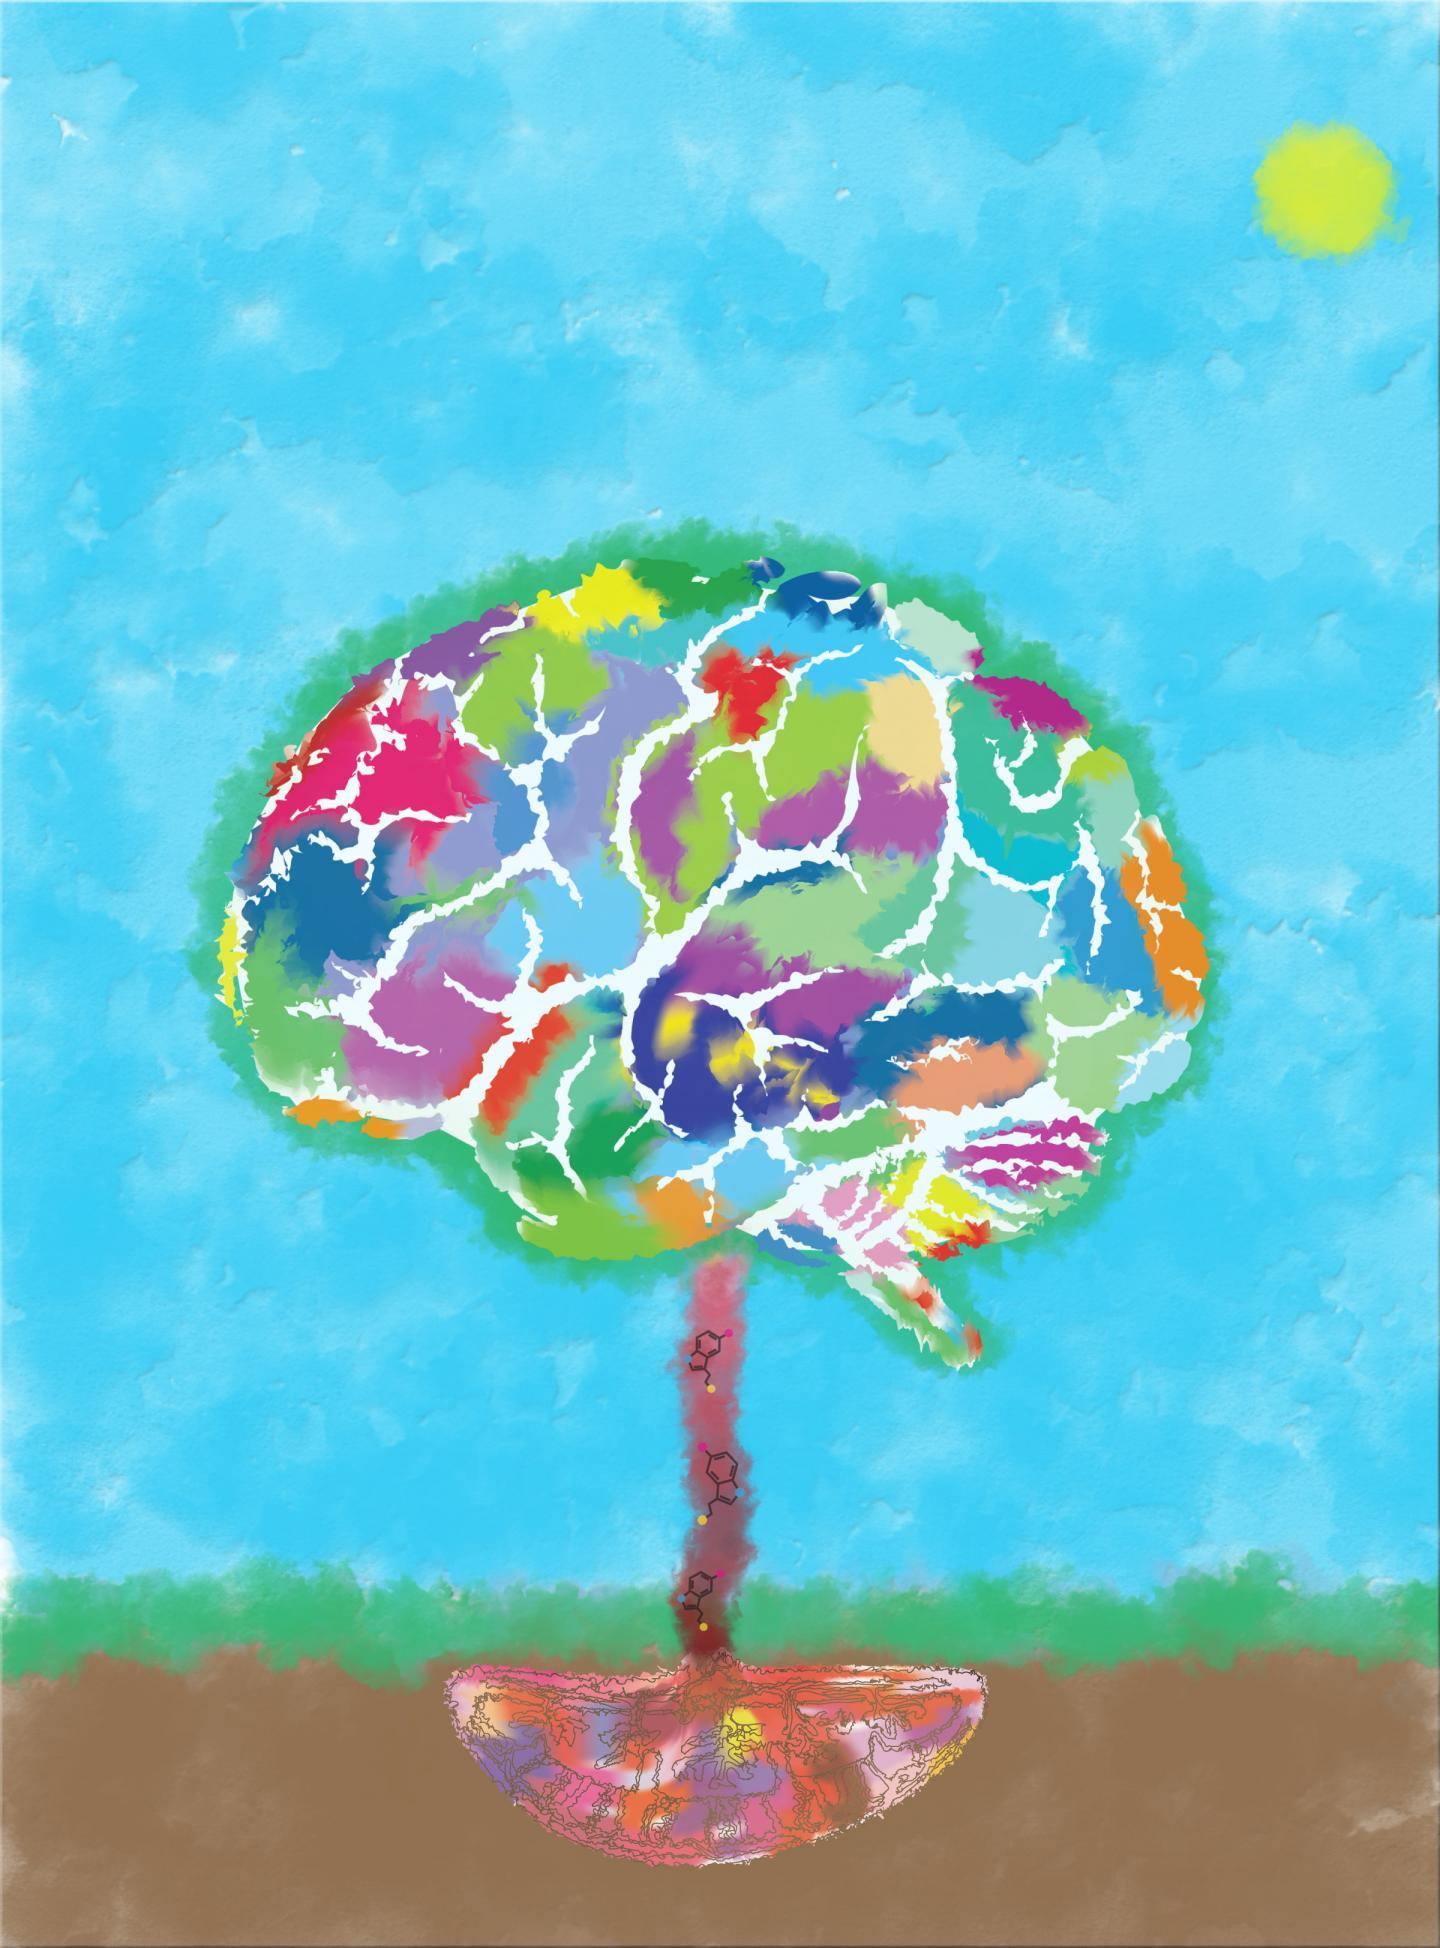 Serotonin as a Brain Growth Factor